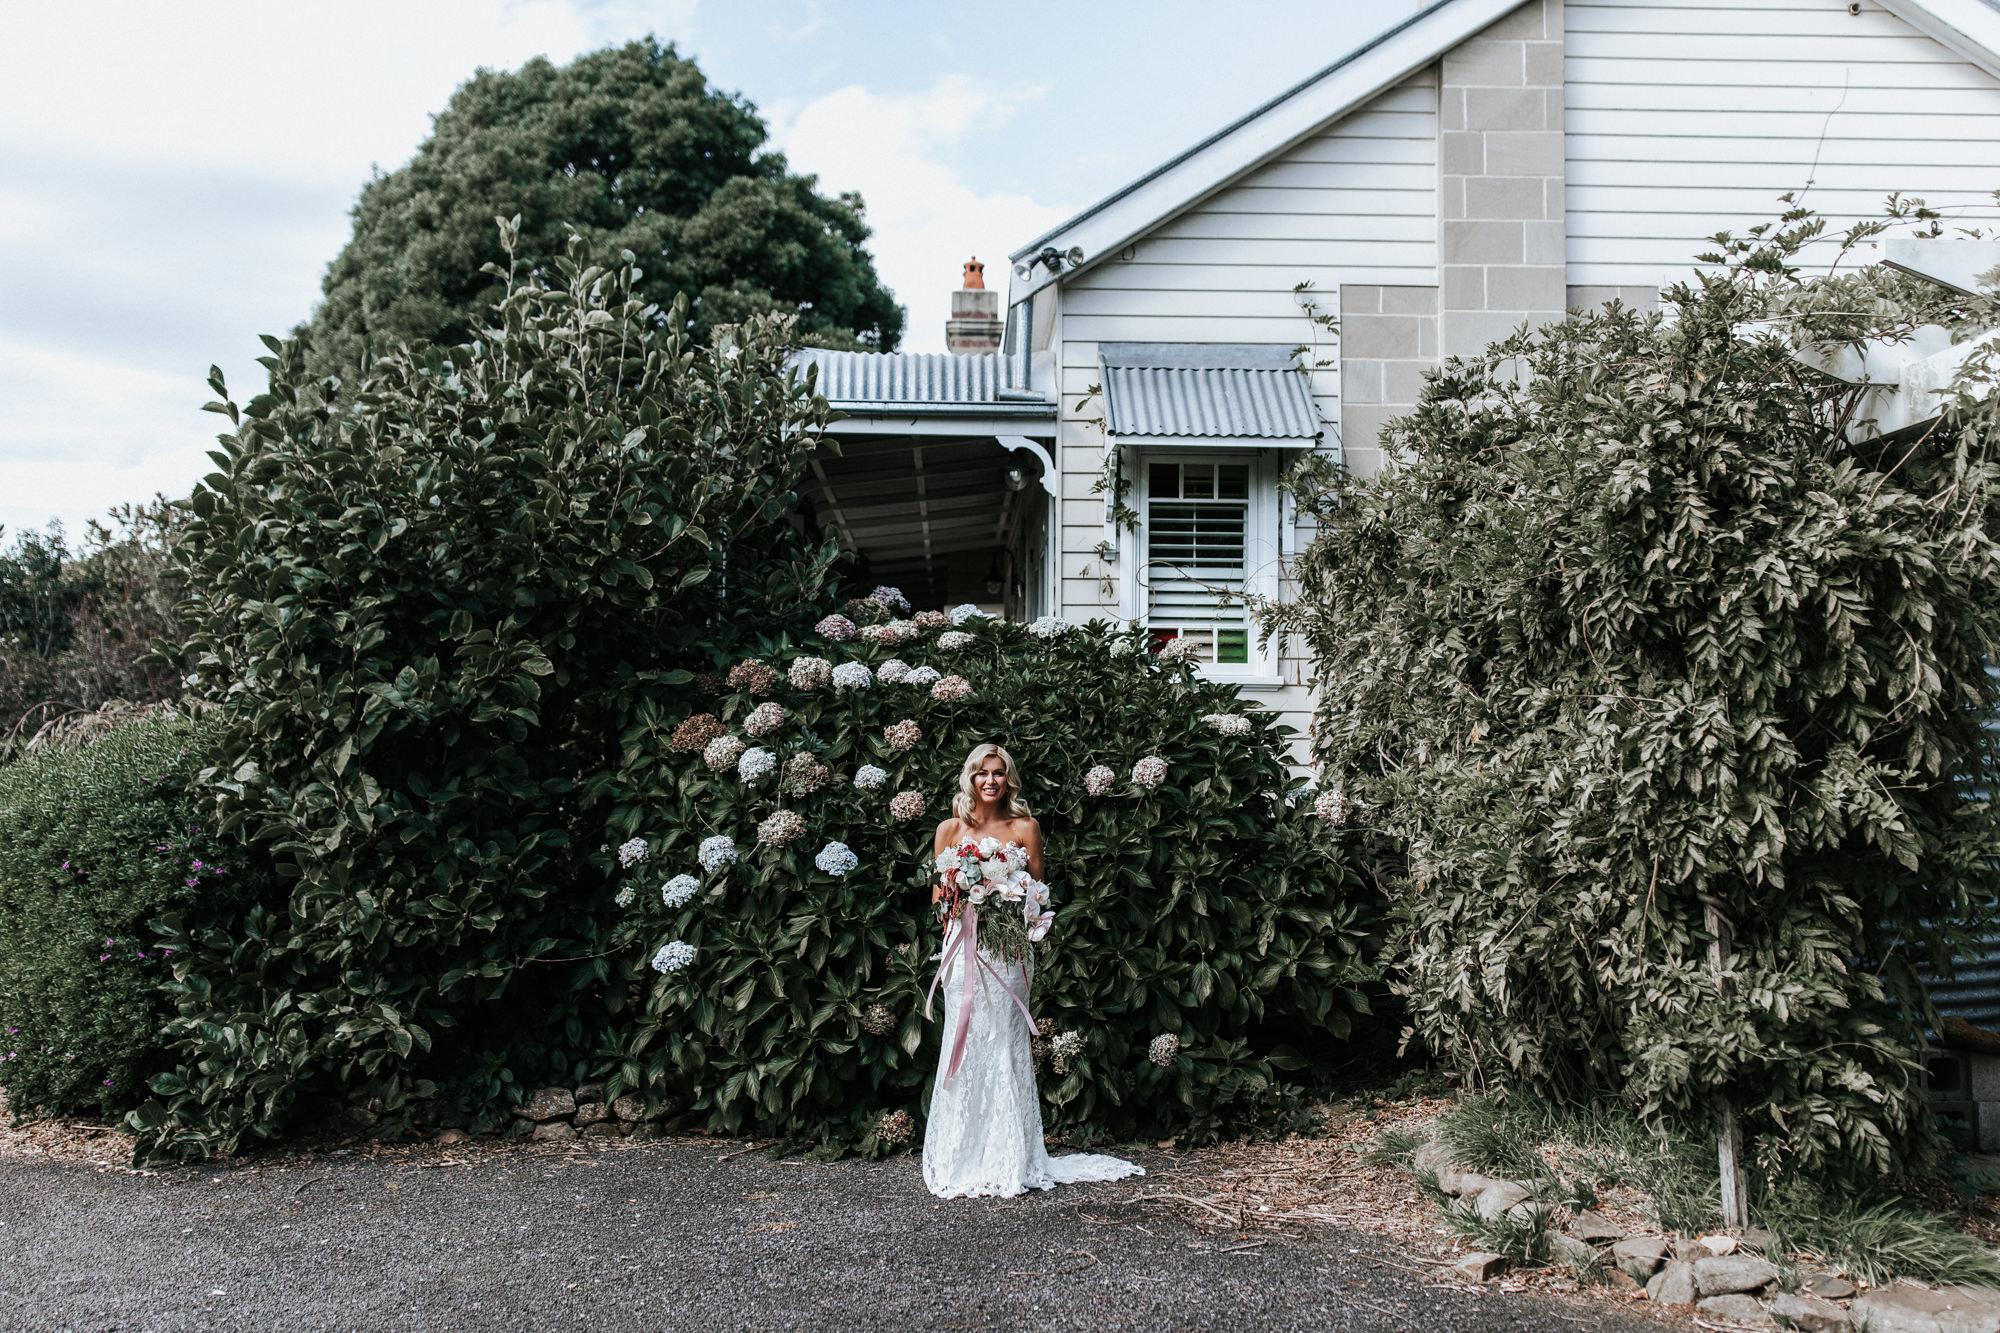 mali-brae-wedding-natalie-scott-baldwin-2.jpg